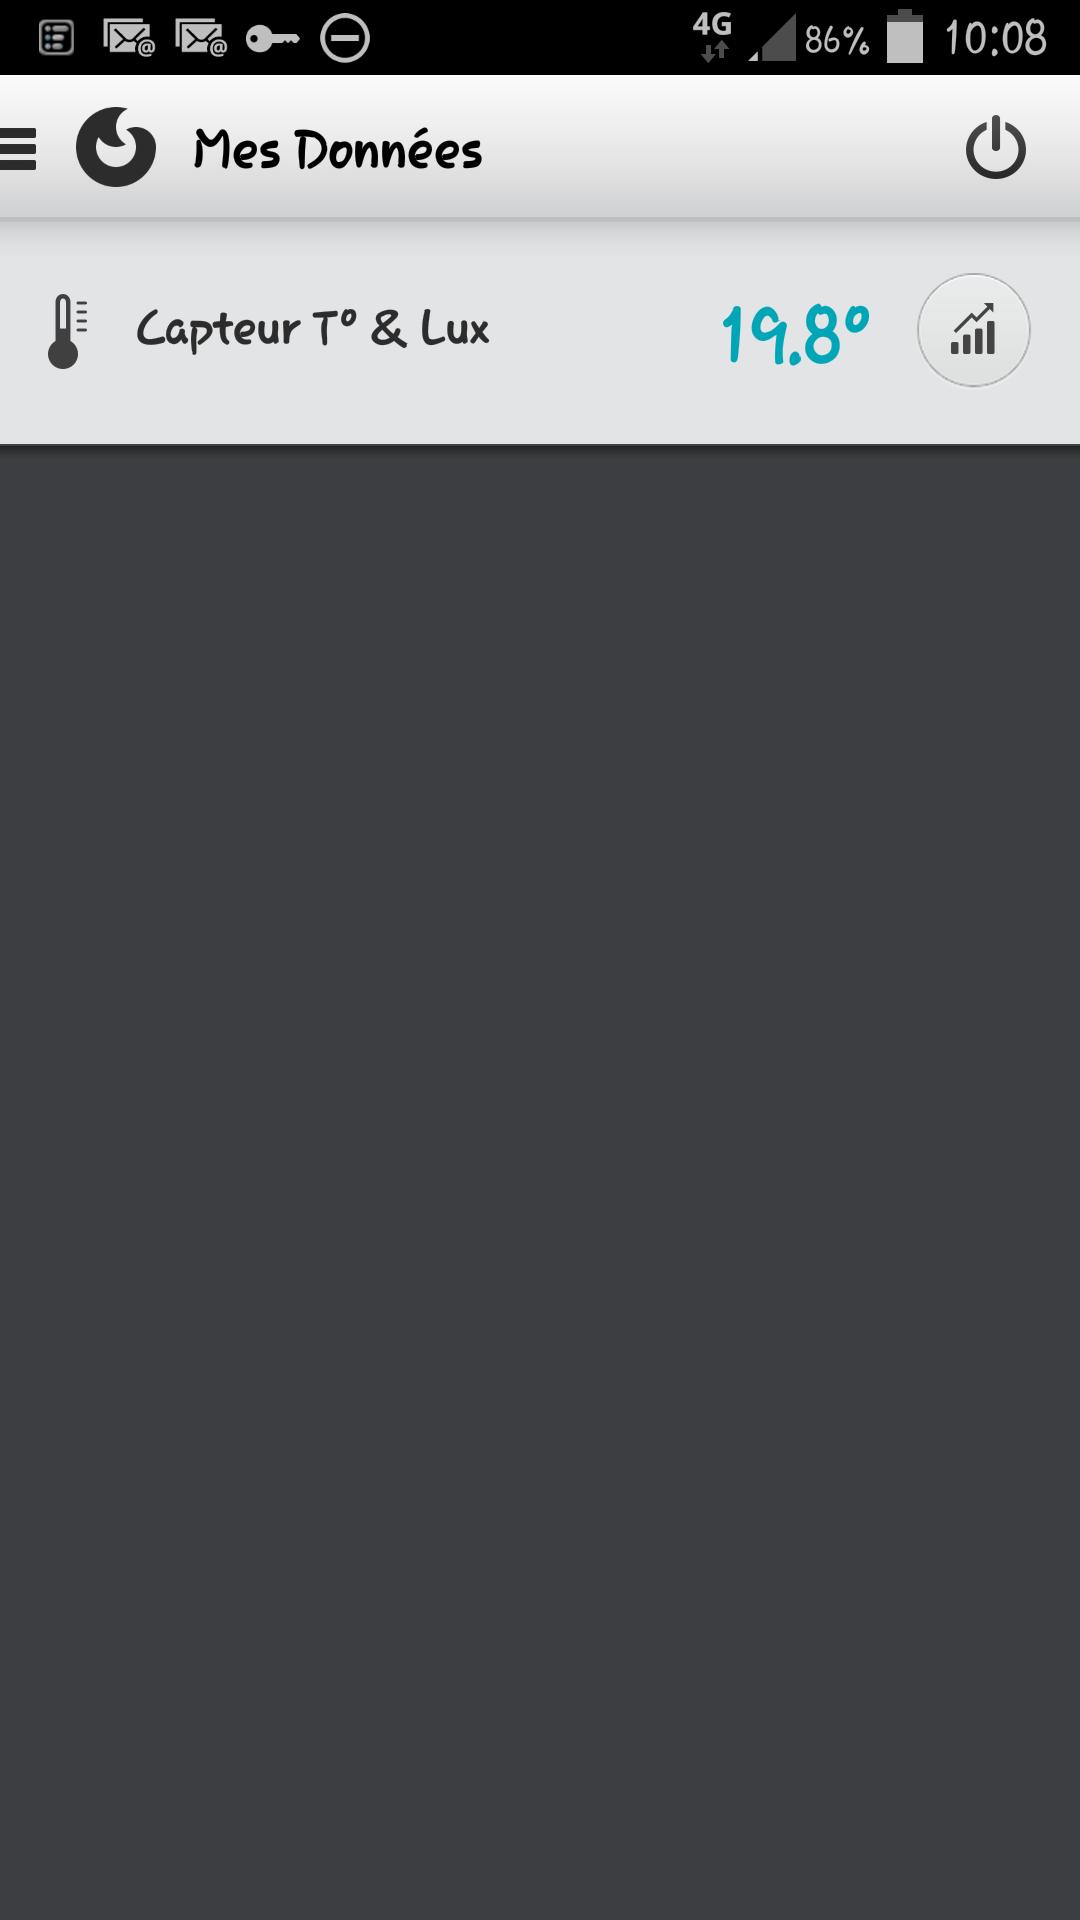 Sonde temperature et luminosité [TA4007] dans l'application mobile? Screen55